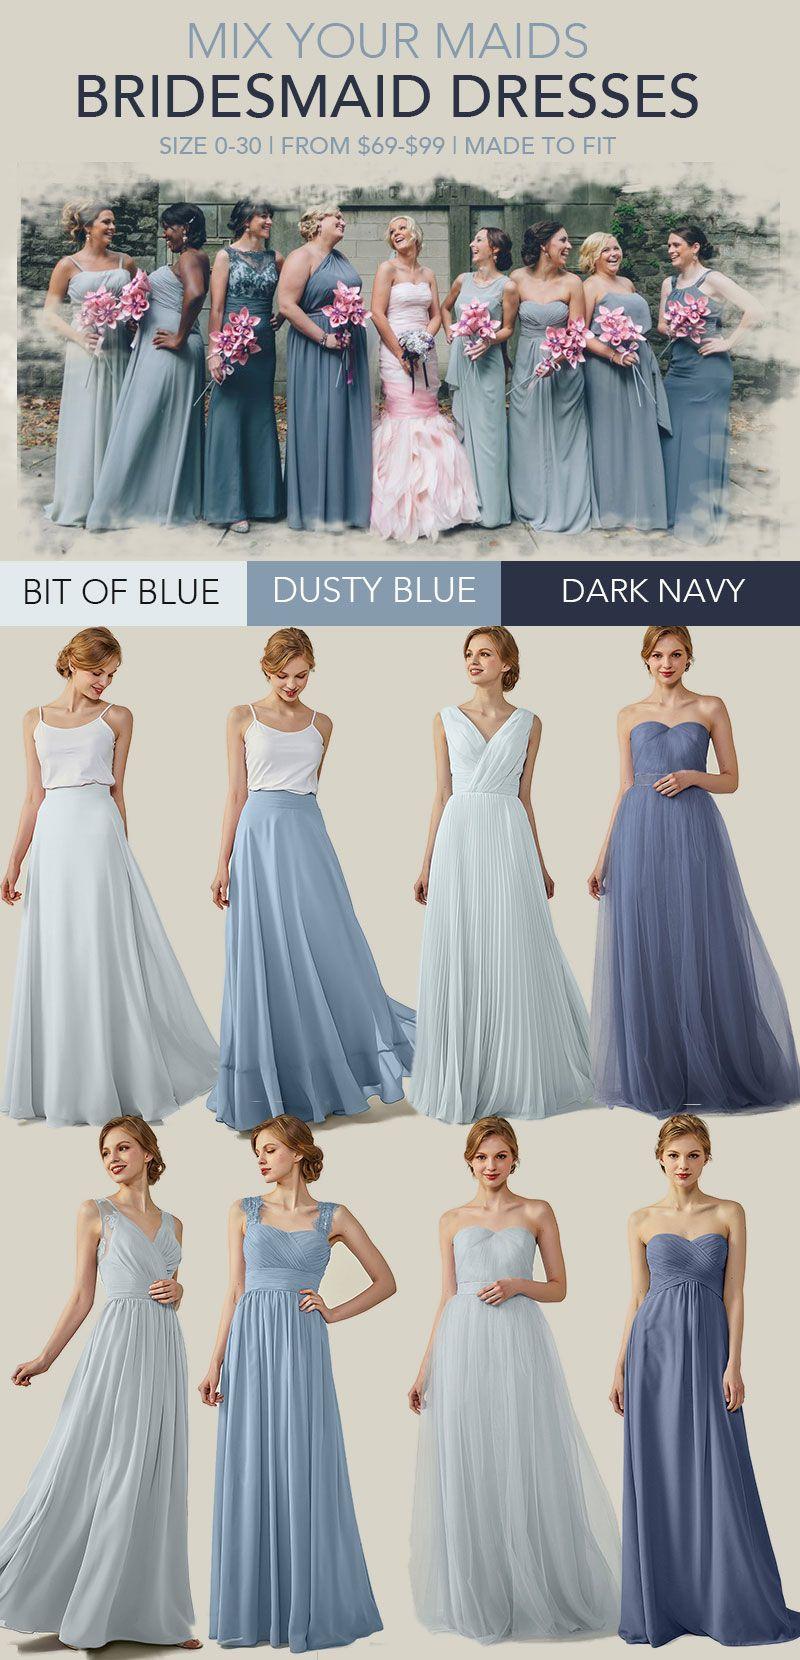 2018 Unique Chiffon Bridesmaid Dress Ombre Blue V Neck Dress Strap Dre Unique Bridesmaid Dresses Bridesmaid Dresses Long Chiffon Bridesmaid Dress Color Schemes